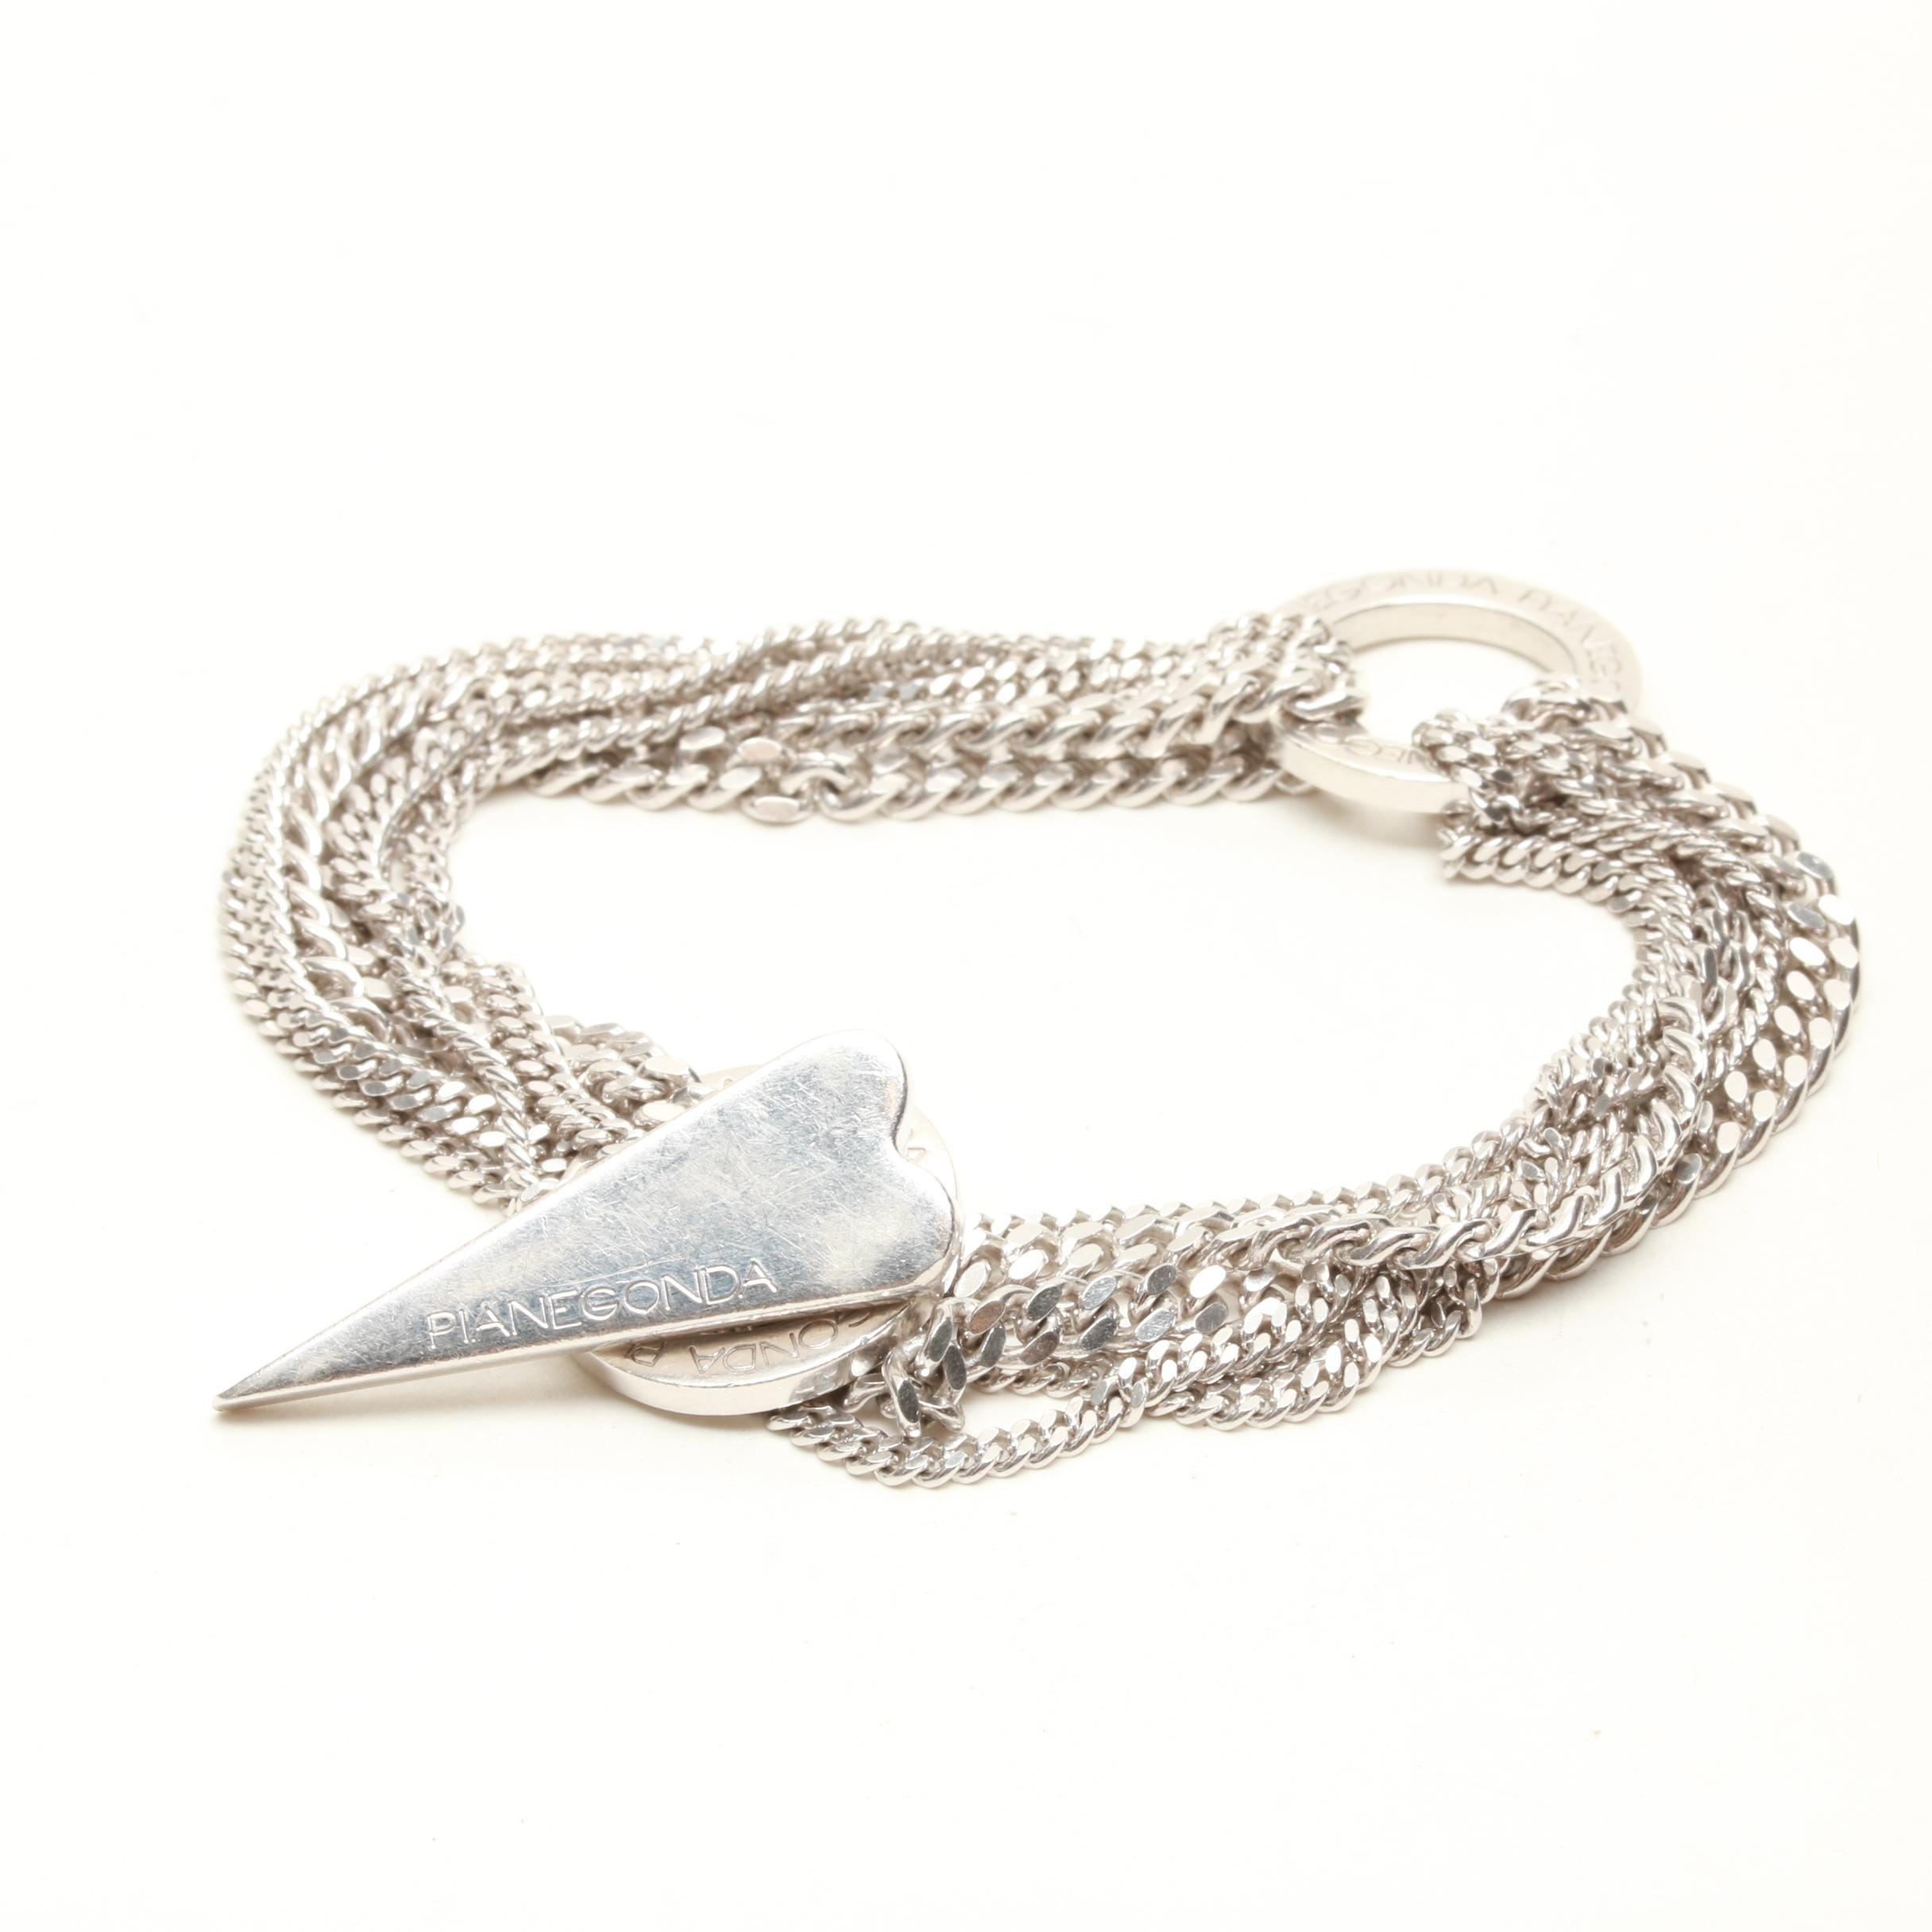 Pianegonda Love Trait D'Union Collection Italian Sterling Silver Bracelet